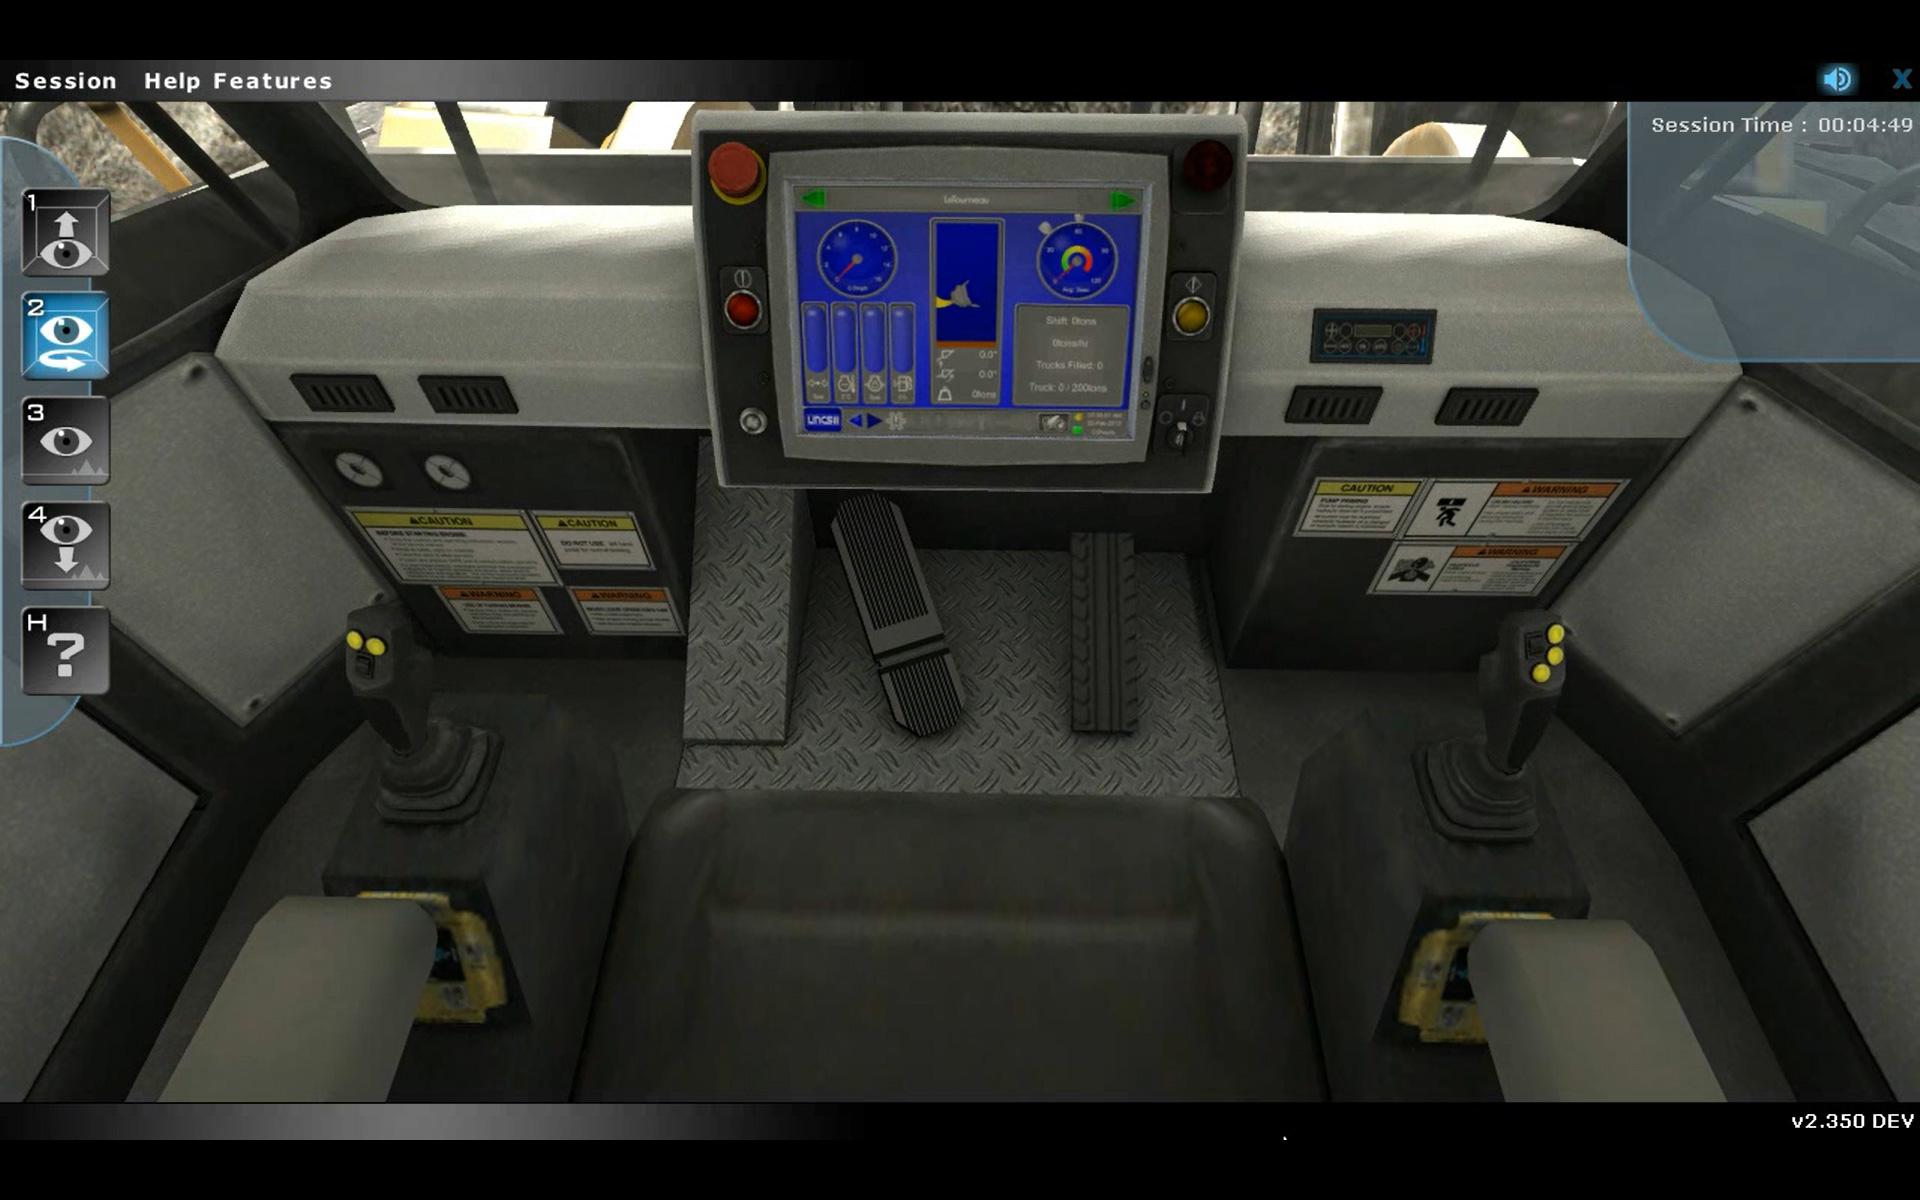 Komatsu Loader Operator Controls Familiarization Training Simulator